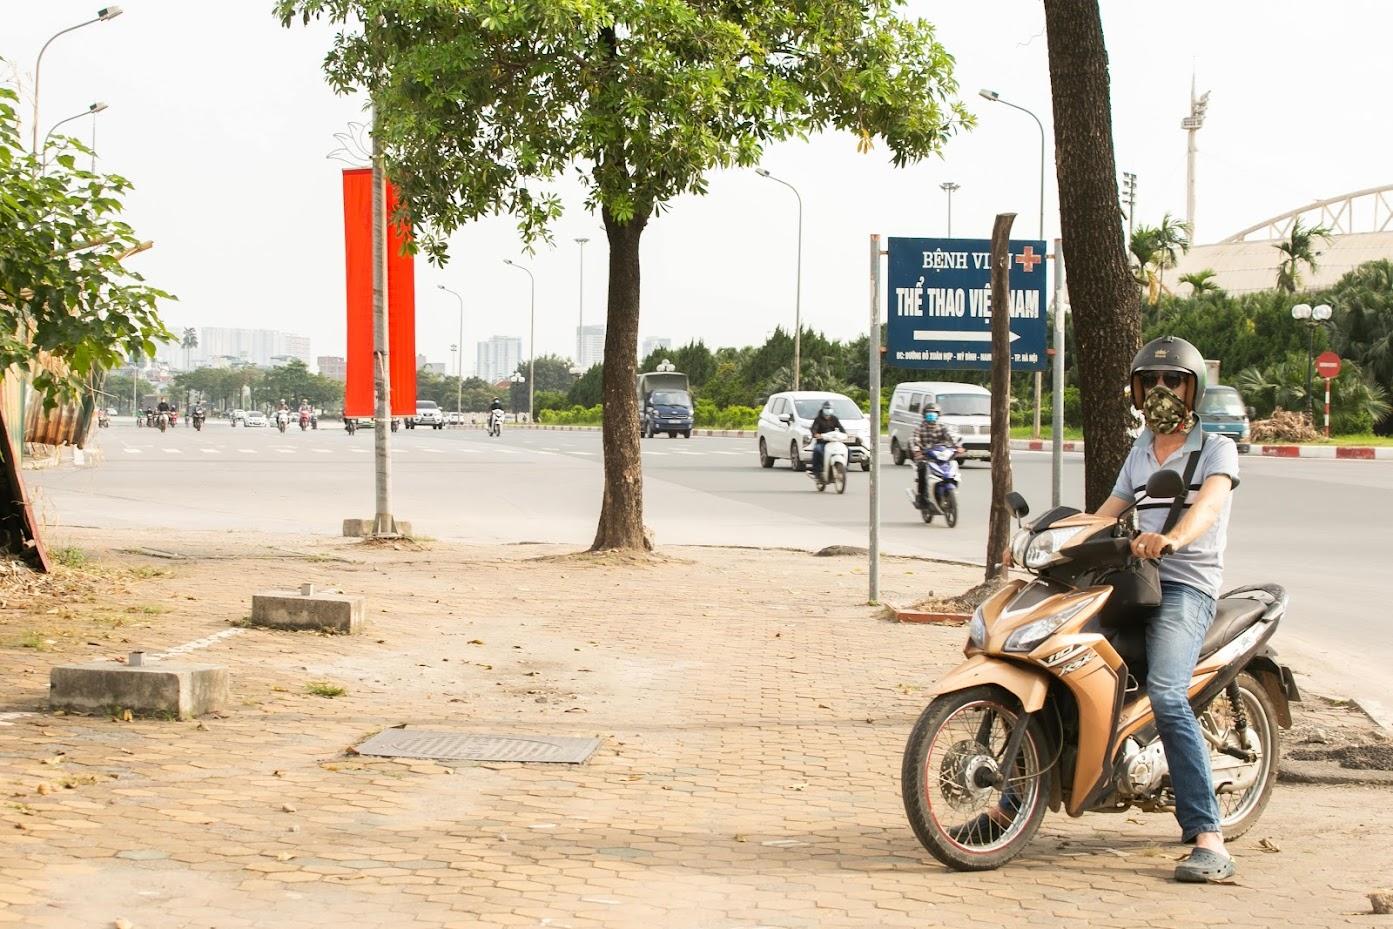 Russian Man Spends 6 Years Traveling Across Vietnam by Motorbike